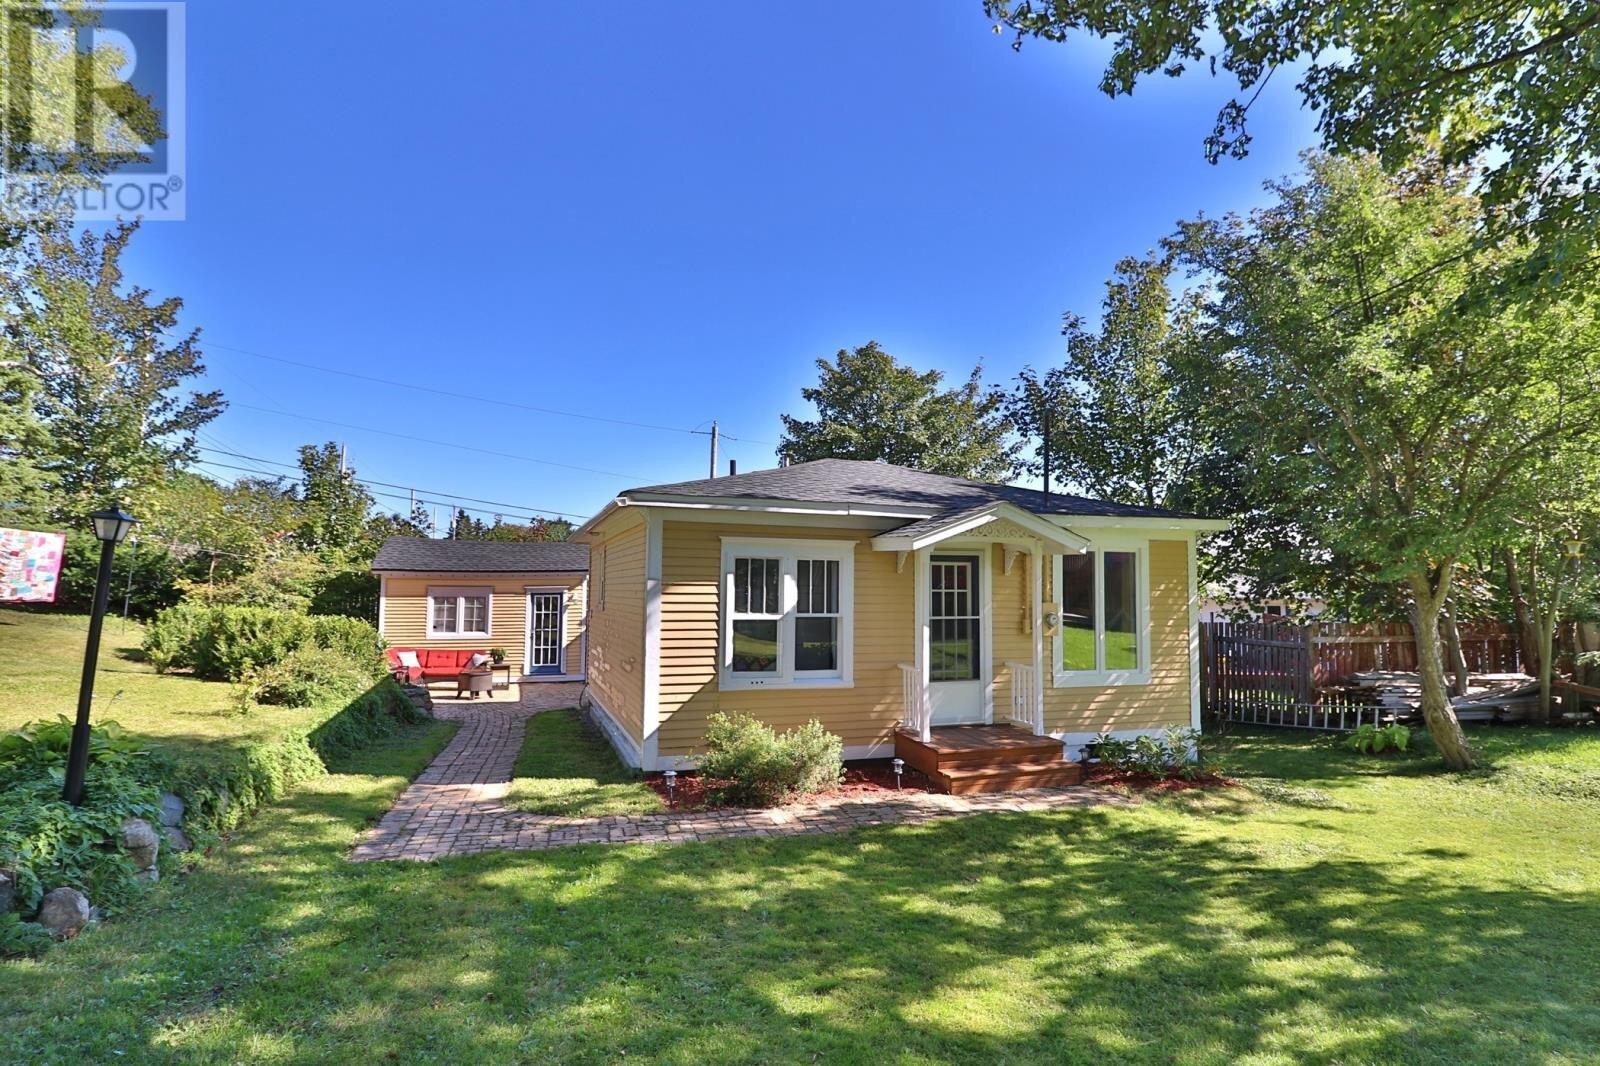 House for sale at 16 Murphys Ln St. John's Newfoundland - MLS: 1224751